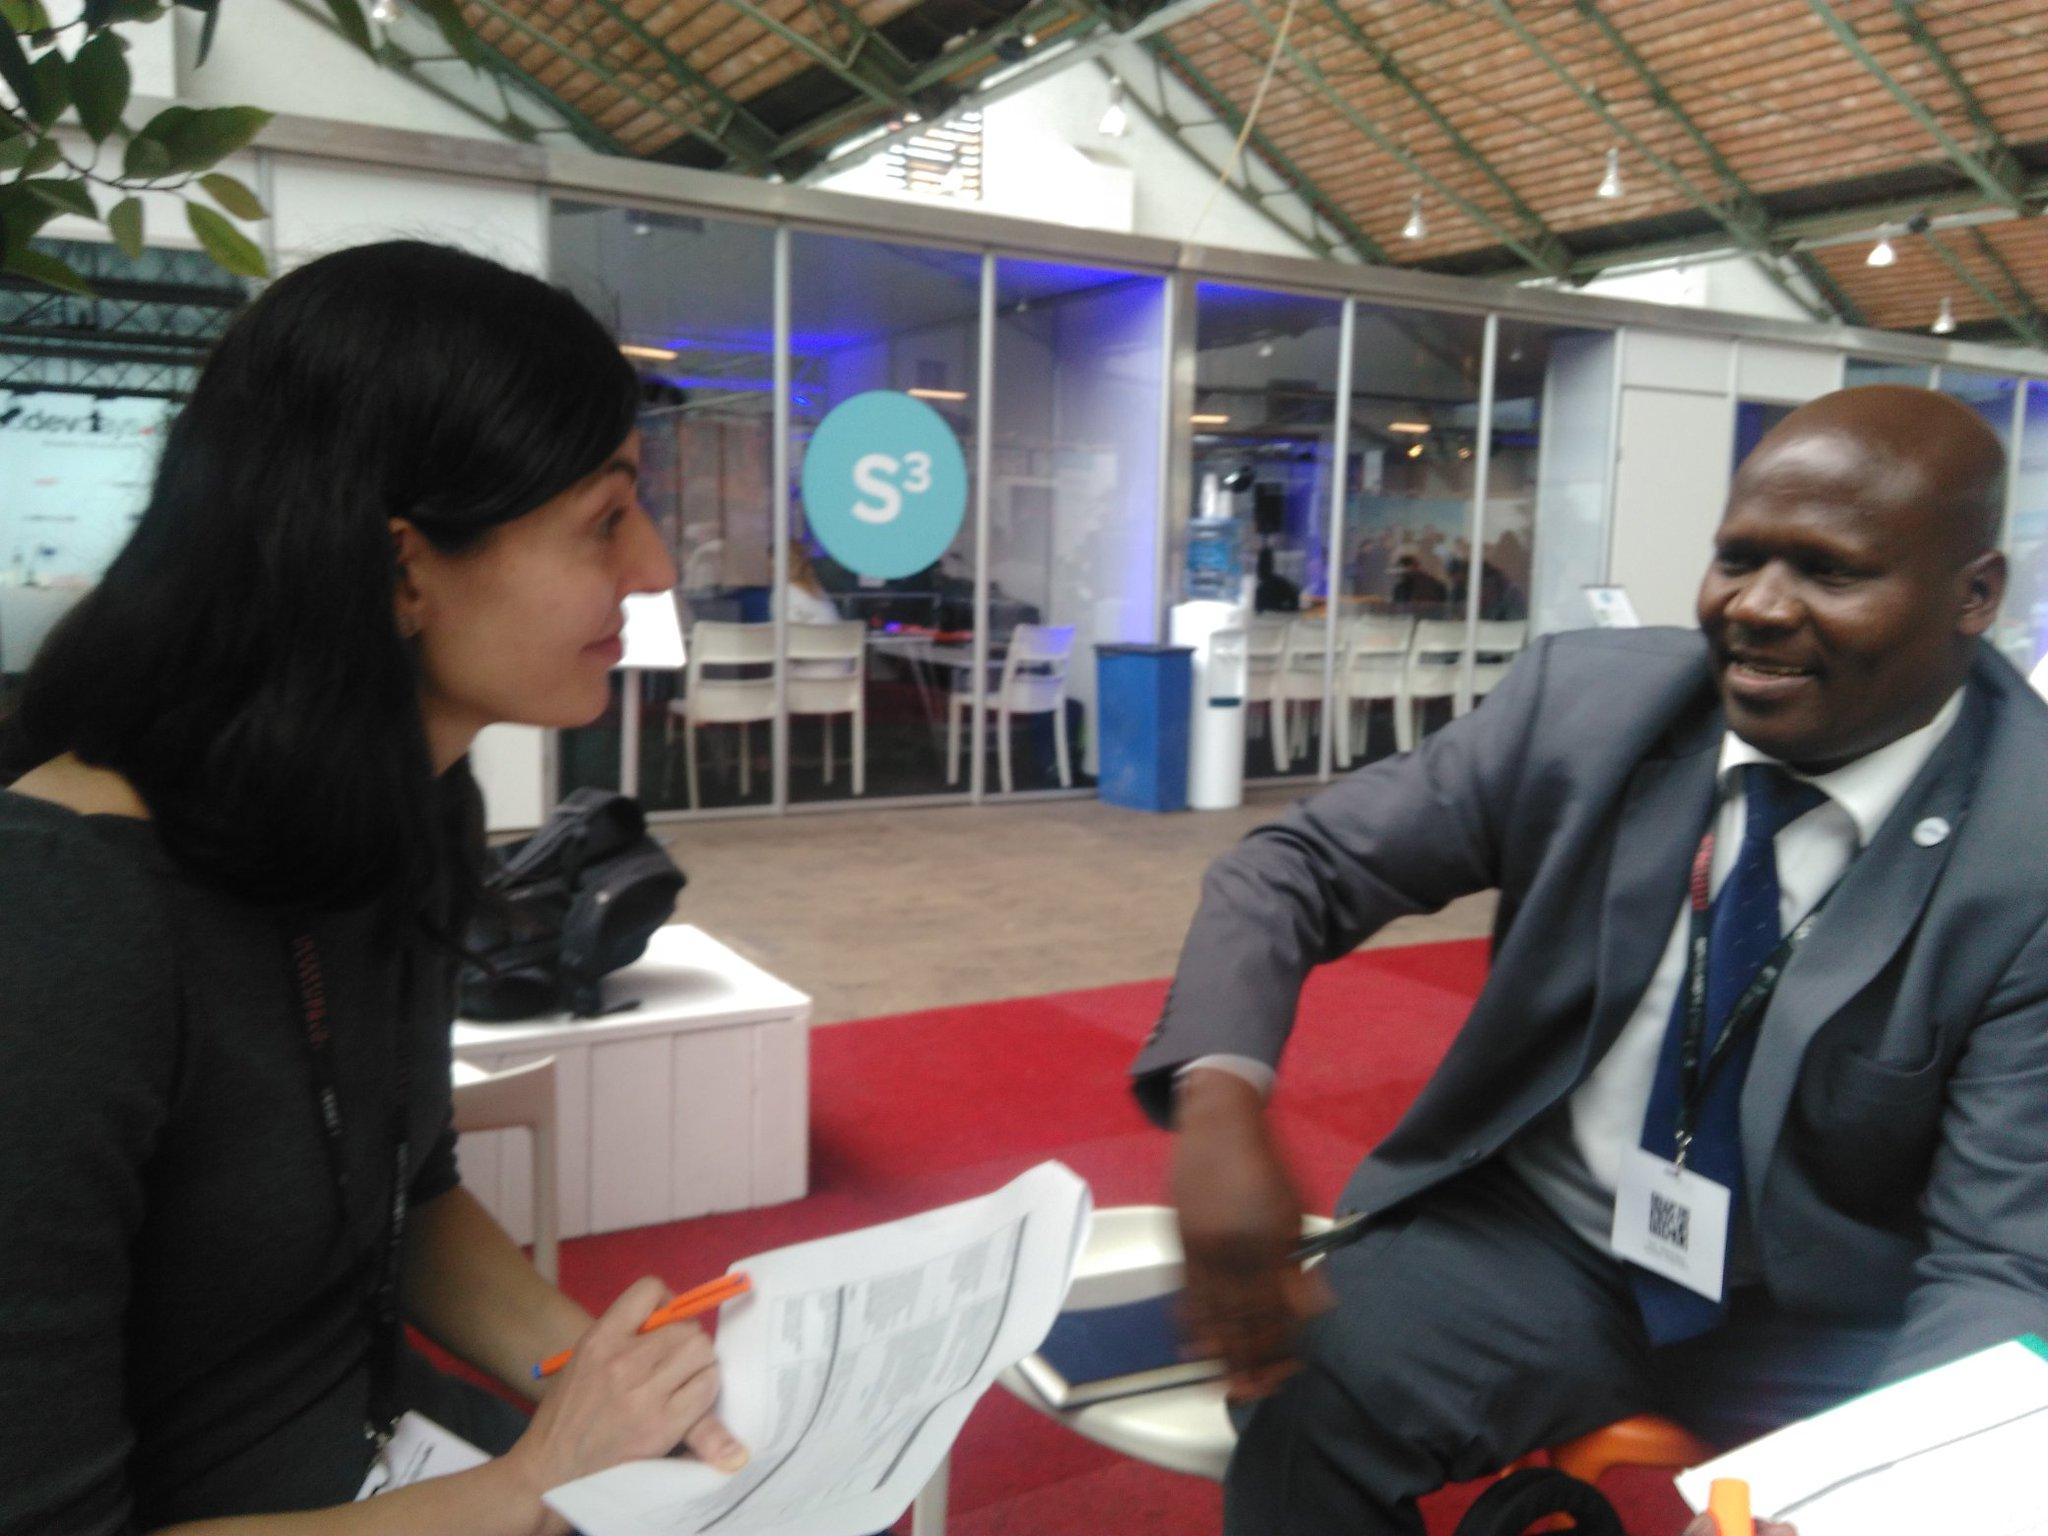 Moderator @SlaveaChankova  and @JChekweko from @RHUganda prep fro tomorrow's high level panel! #EDD17 https://t.co/eqqNk6xRRe